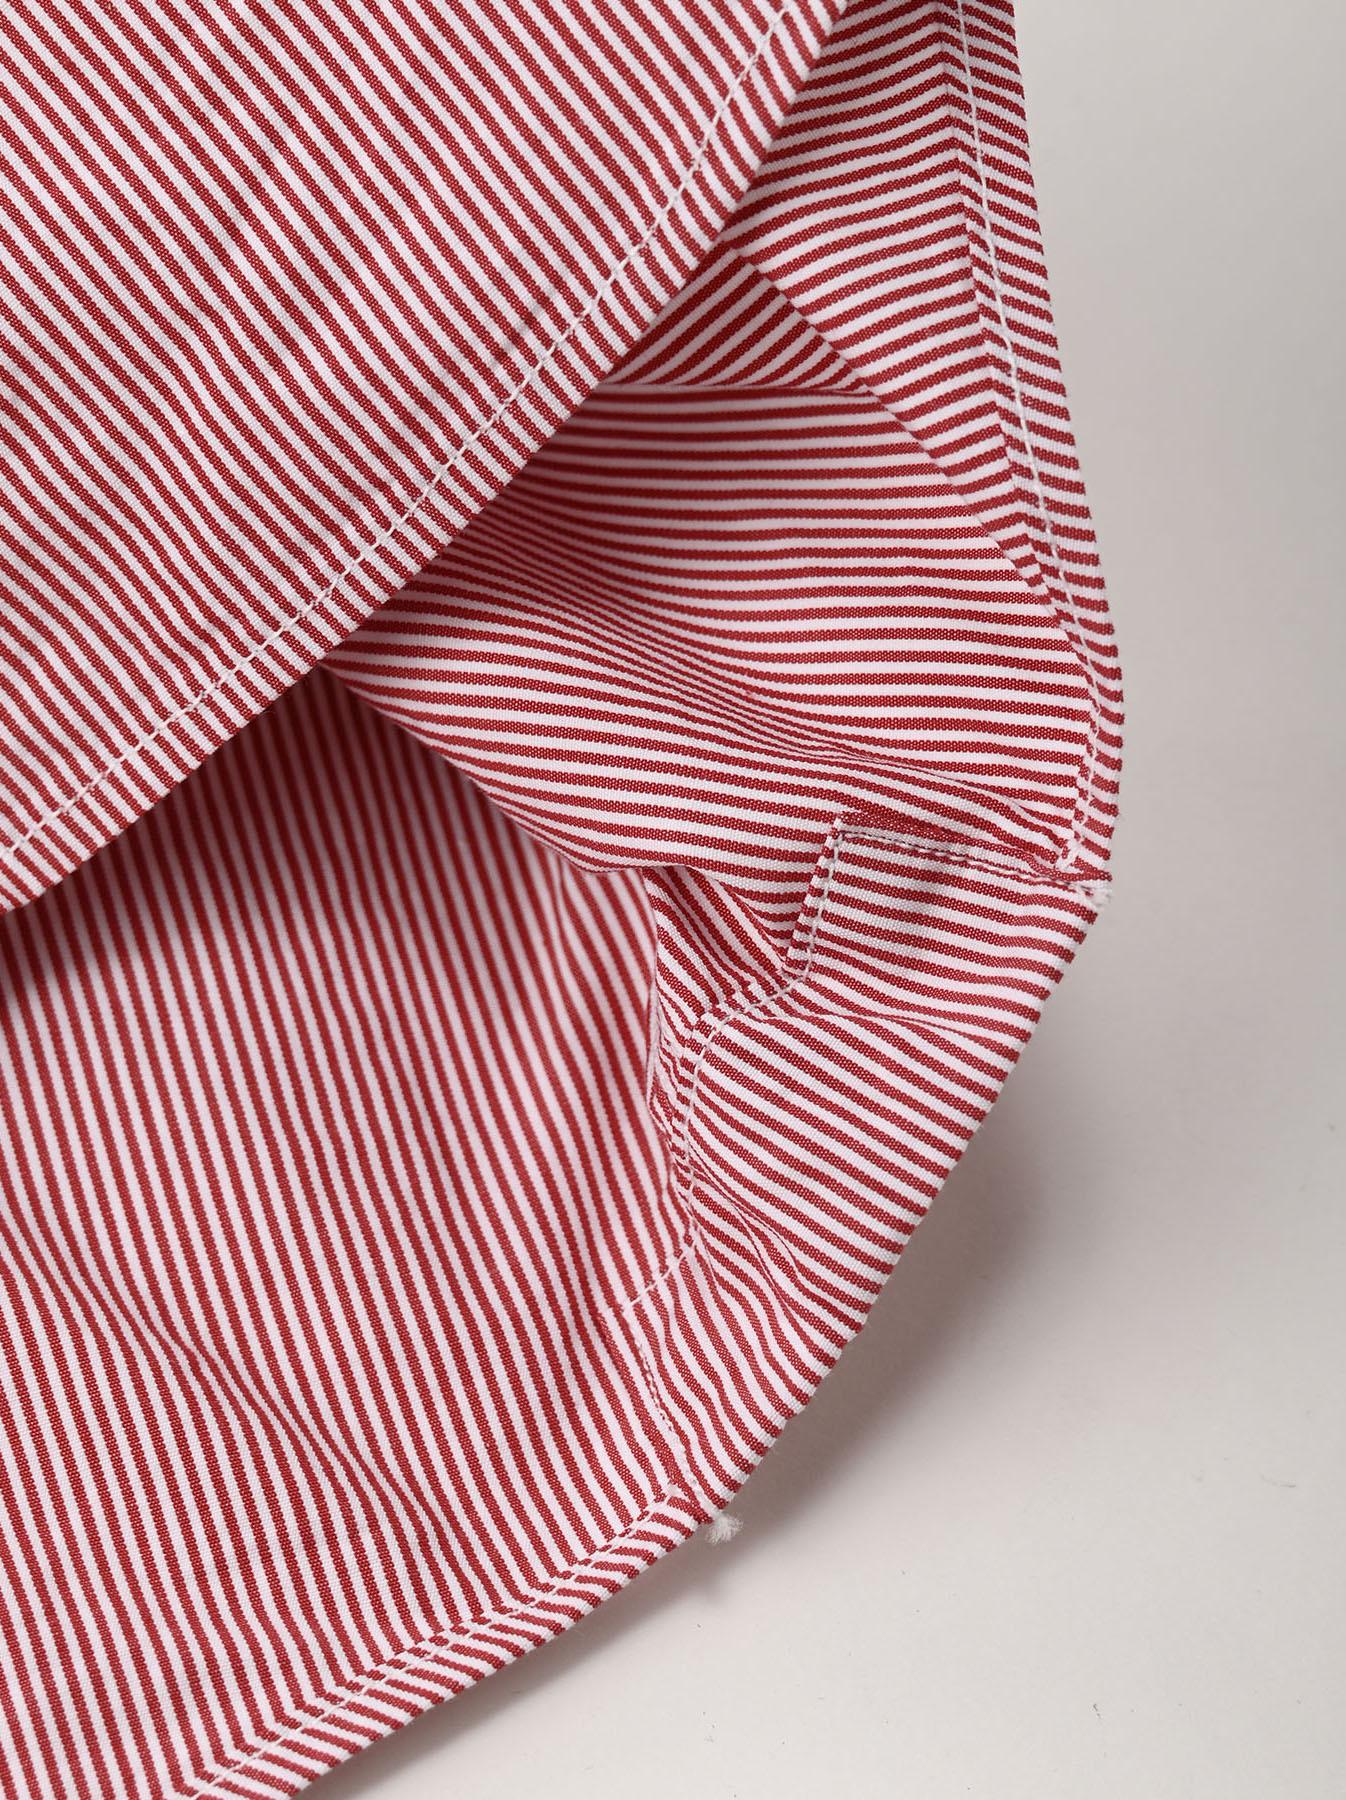 Miko Stand Collar 908 Ocean Shirt-12